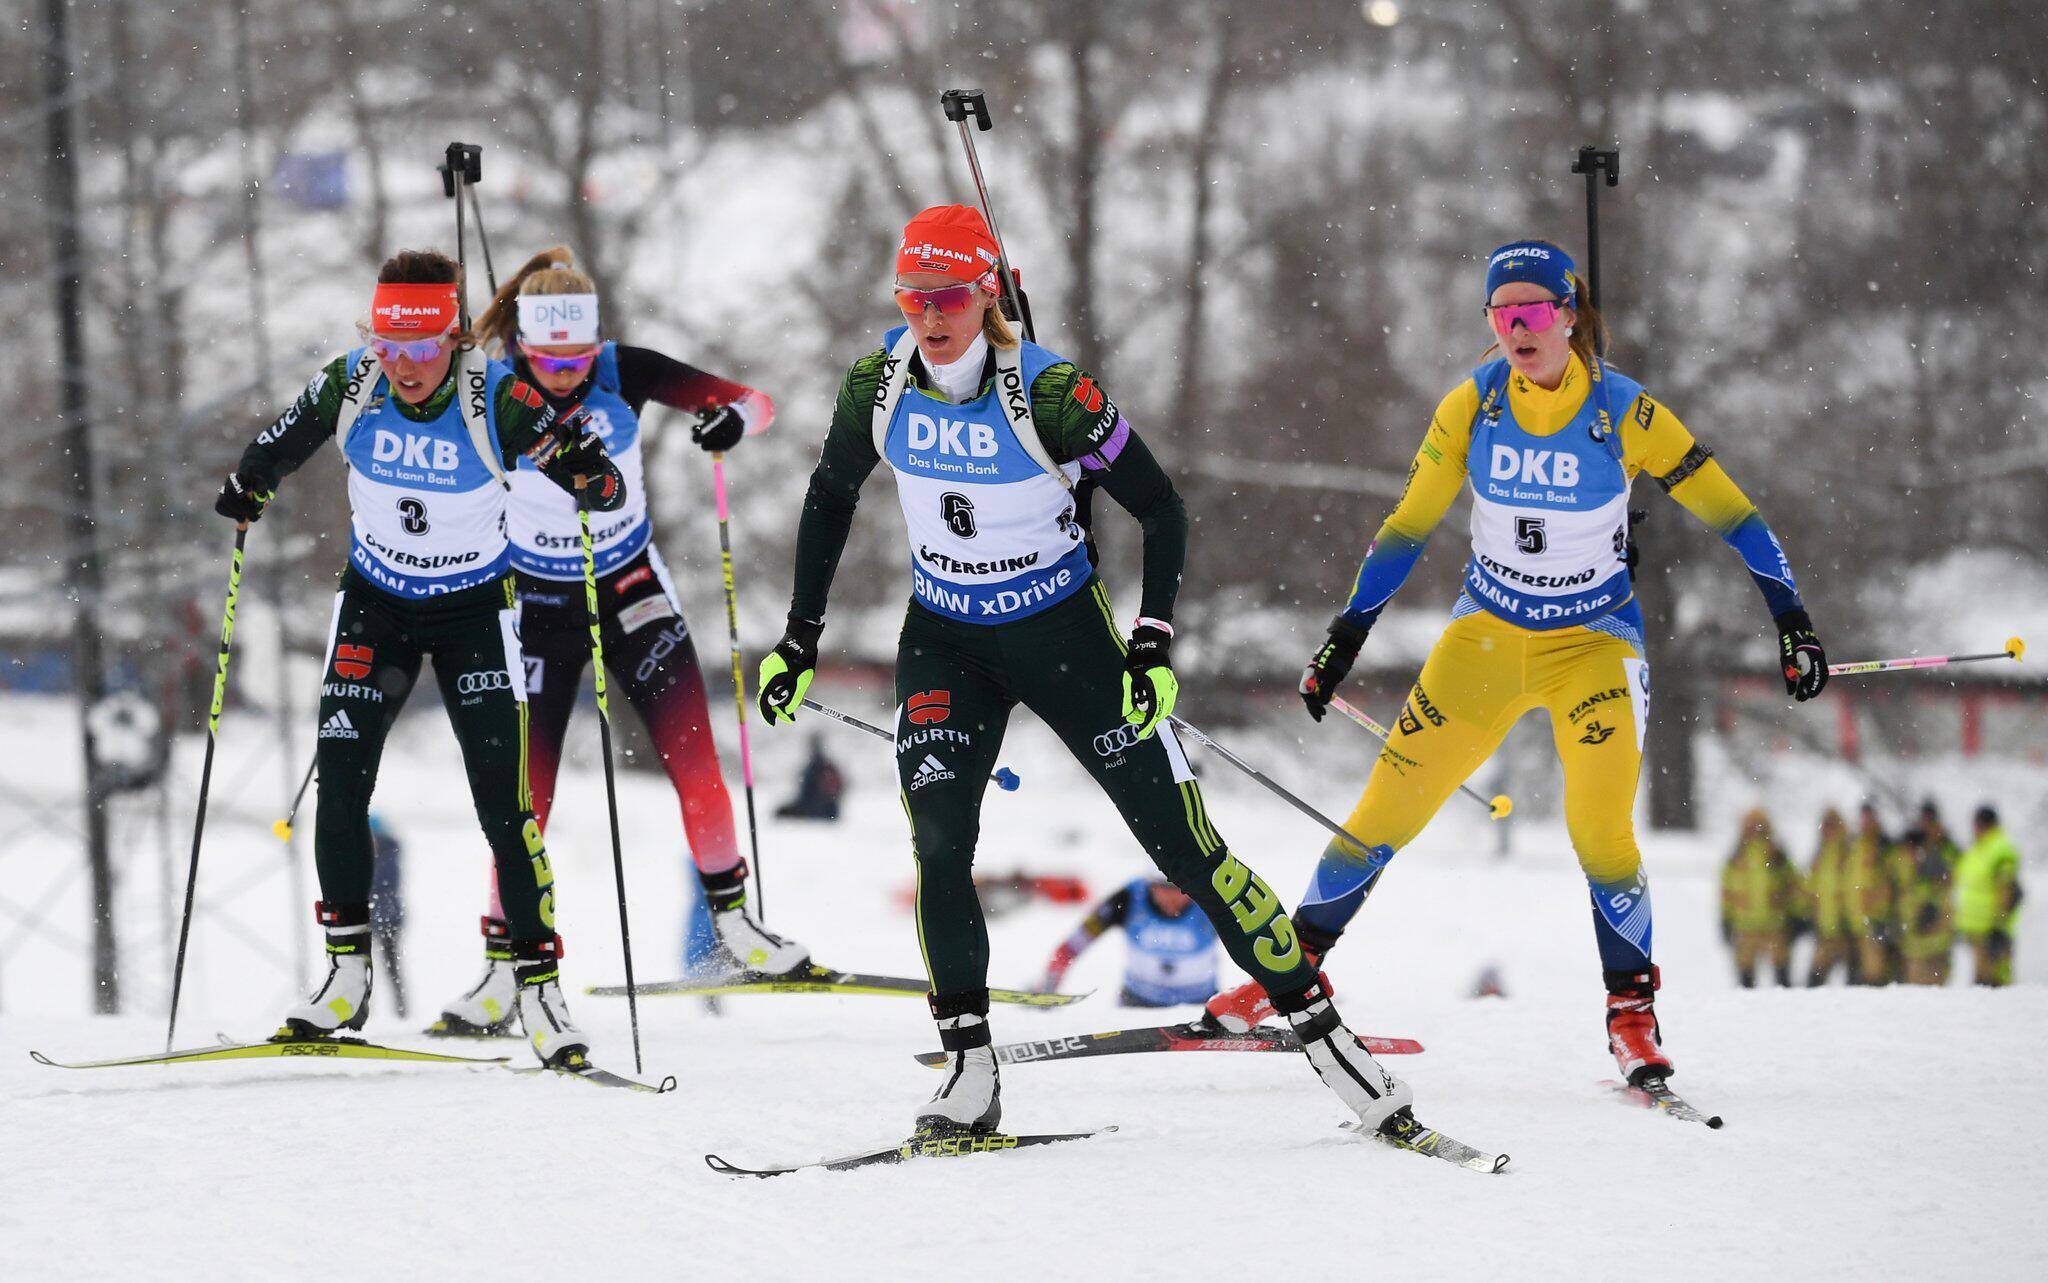 Bild zu Biathlon, Biathlon-WM, Östersund, Denise Herrmann, Laura Dahlmeier, Ingrid Landmark Tandrevold